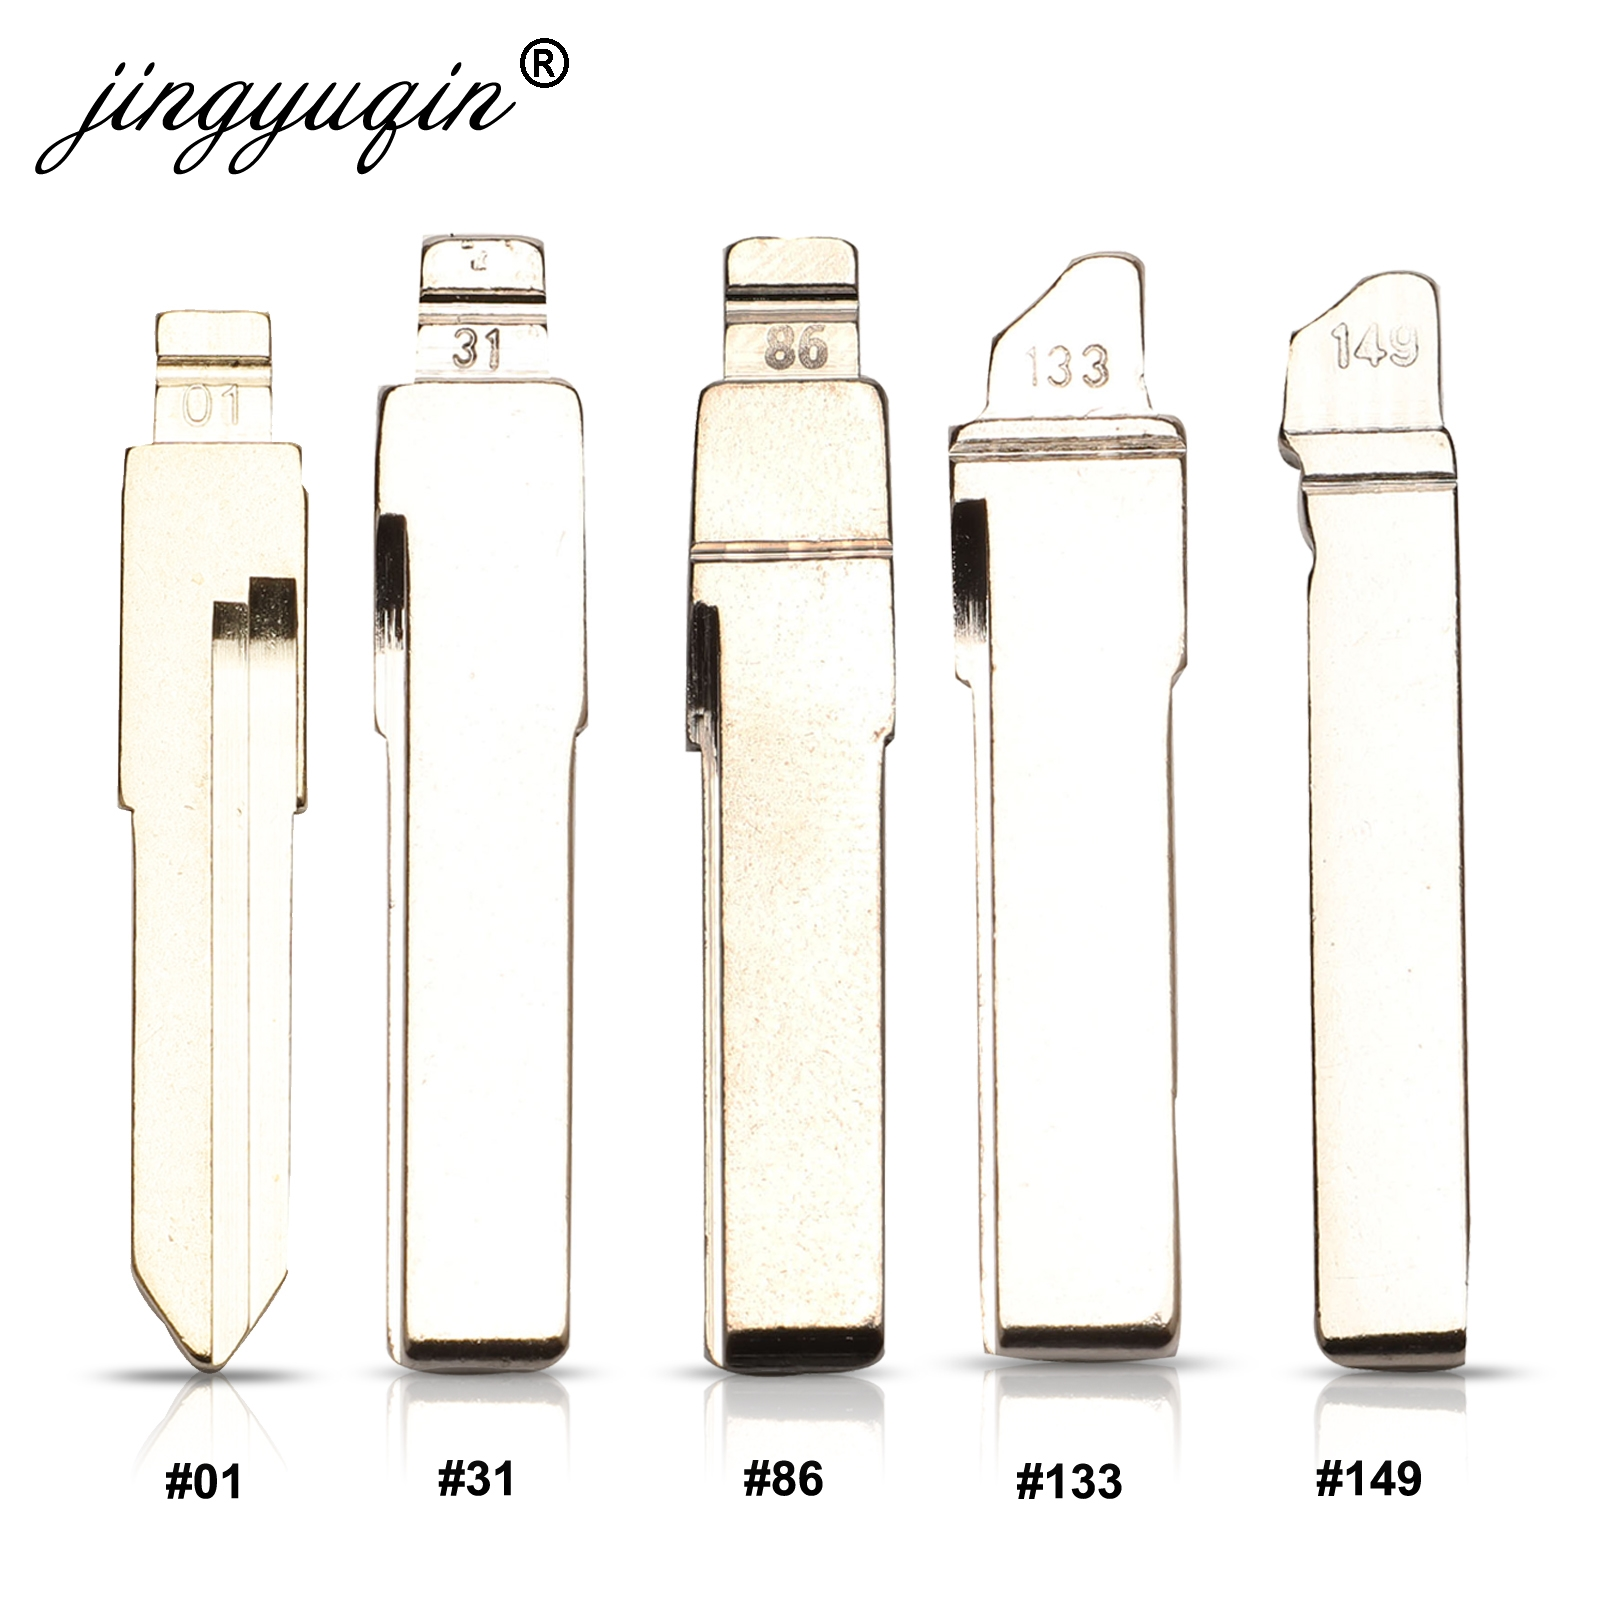 Jingyuqin #01 #31 #86 #133 #149 Car Key Blade For Audi VW Polo Passat B5 Tiguan Golf Santana Bora Seat Skoda HU66 Auto Key Blank